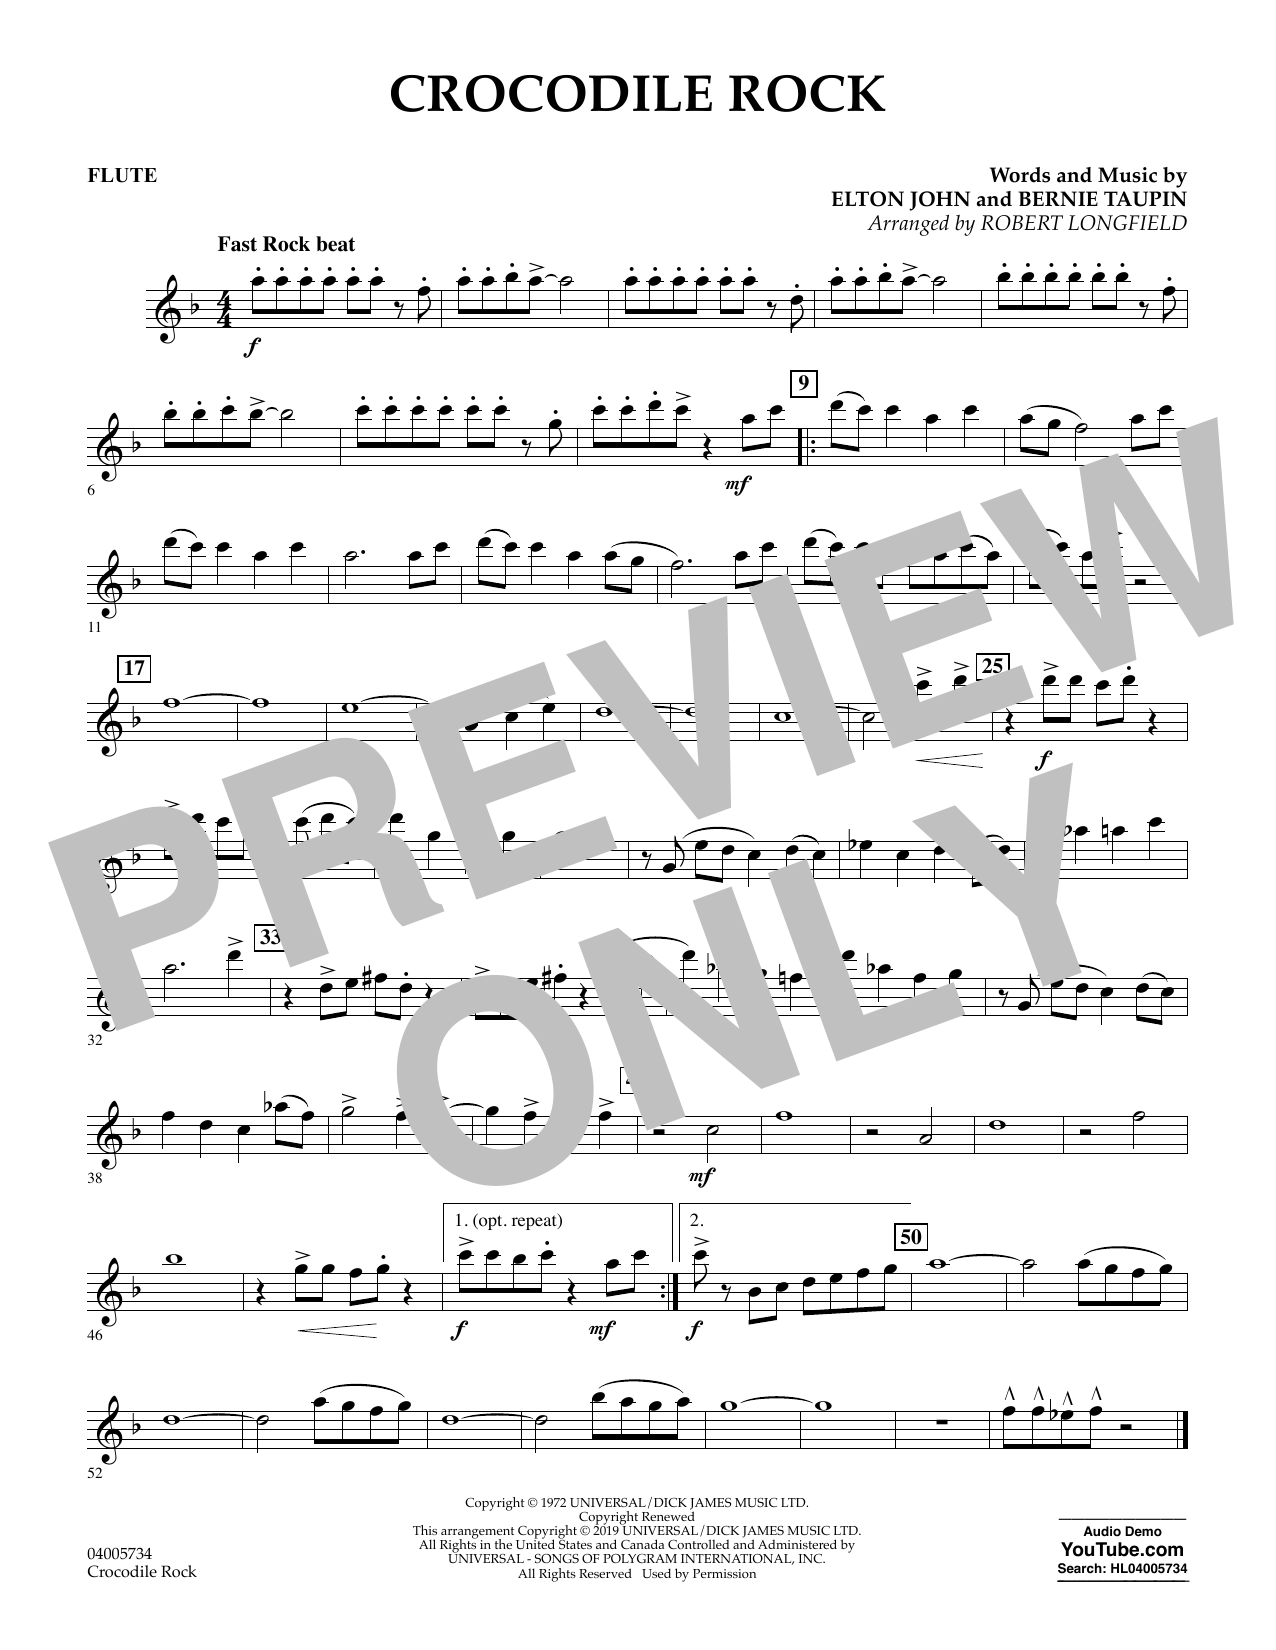 Crocodile Rock (arr. Robert Longfield) - Flute (Concert Band)